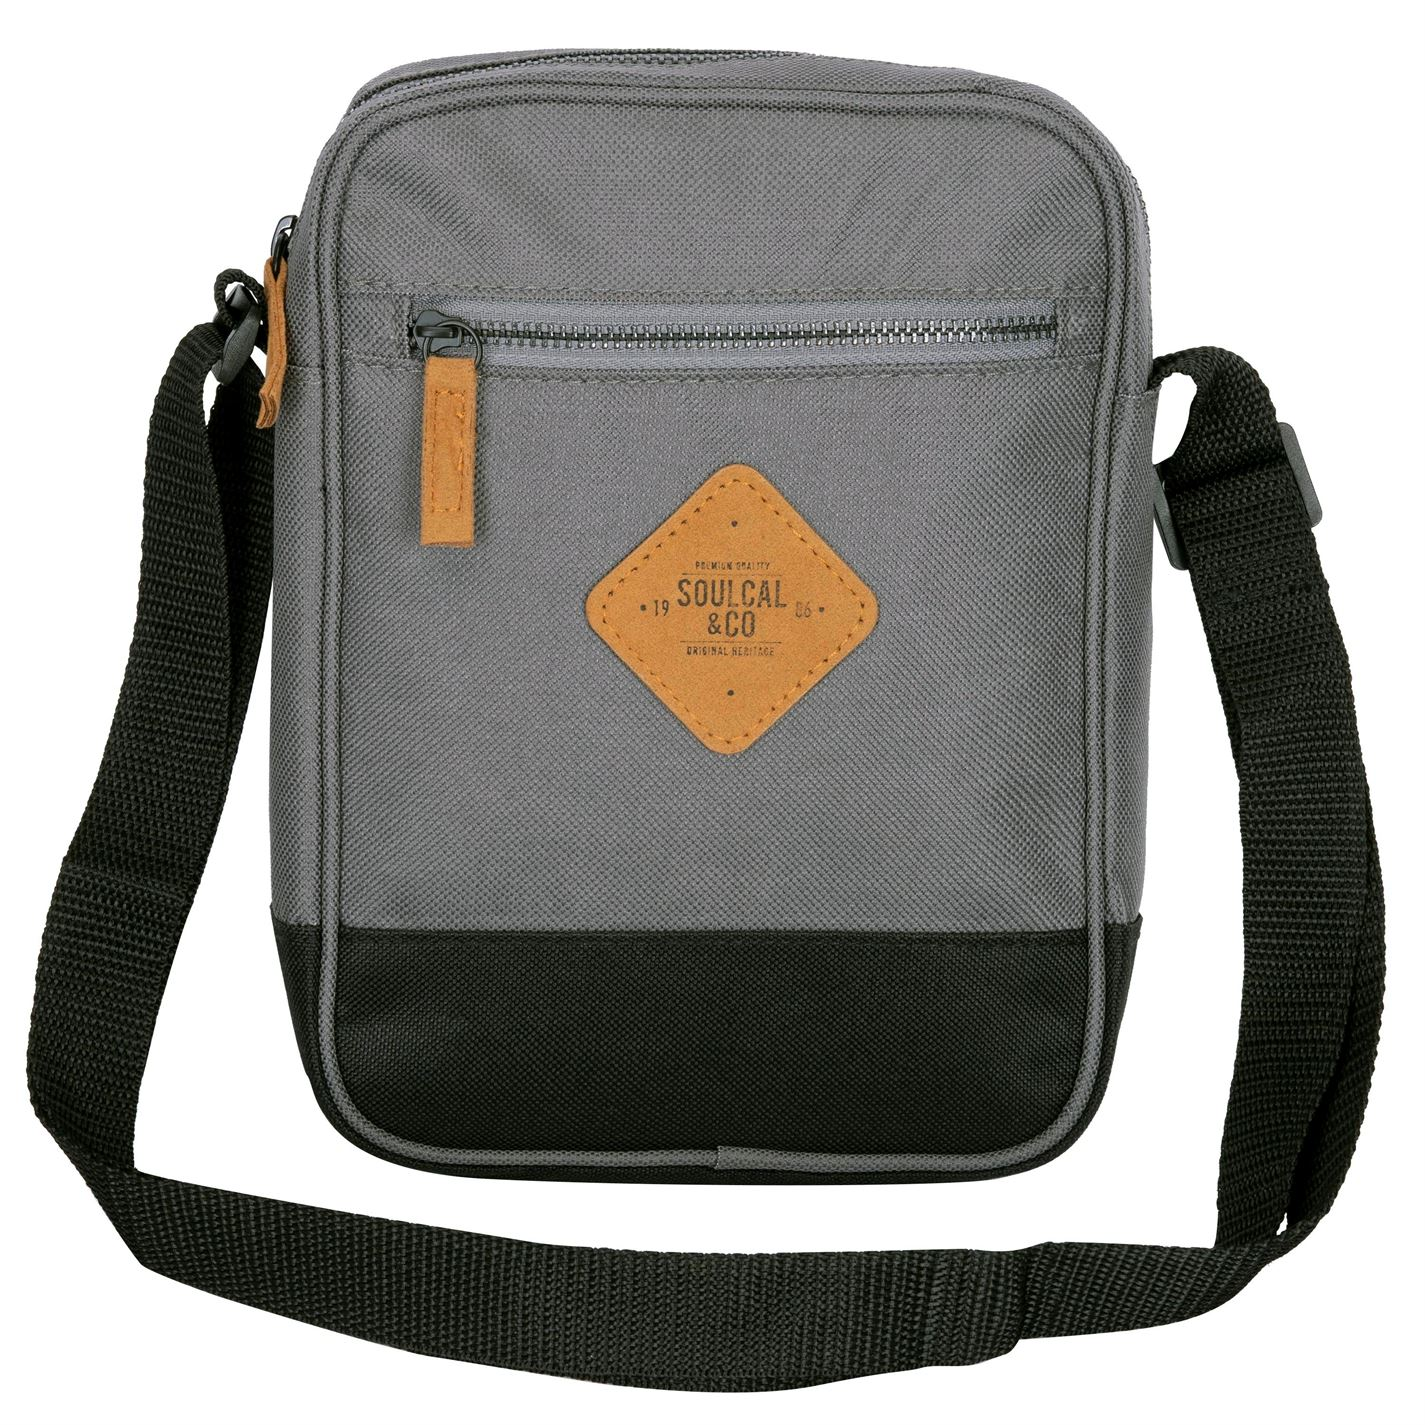 Unisex-SoulCal-Mini-Gadget-Bag-Zip-New thumbnail 4